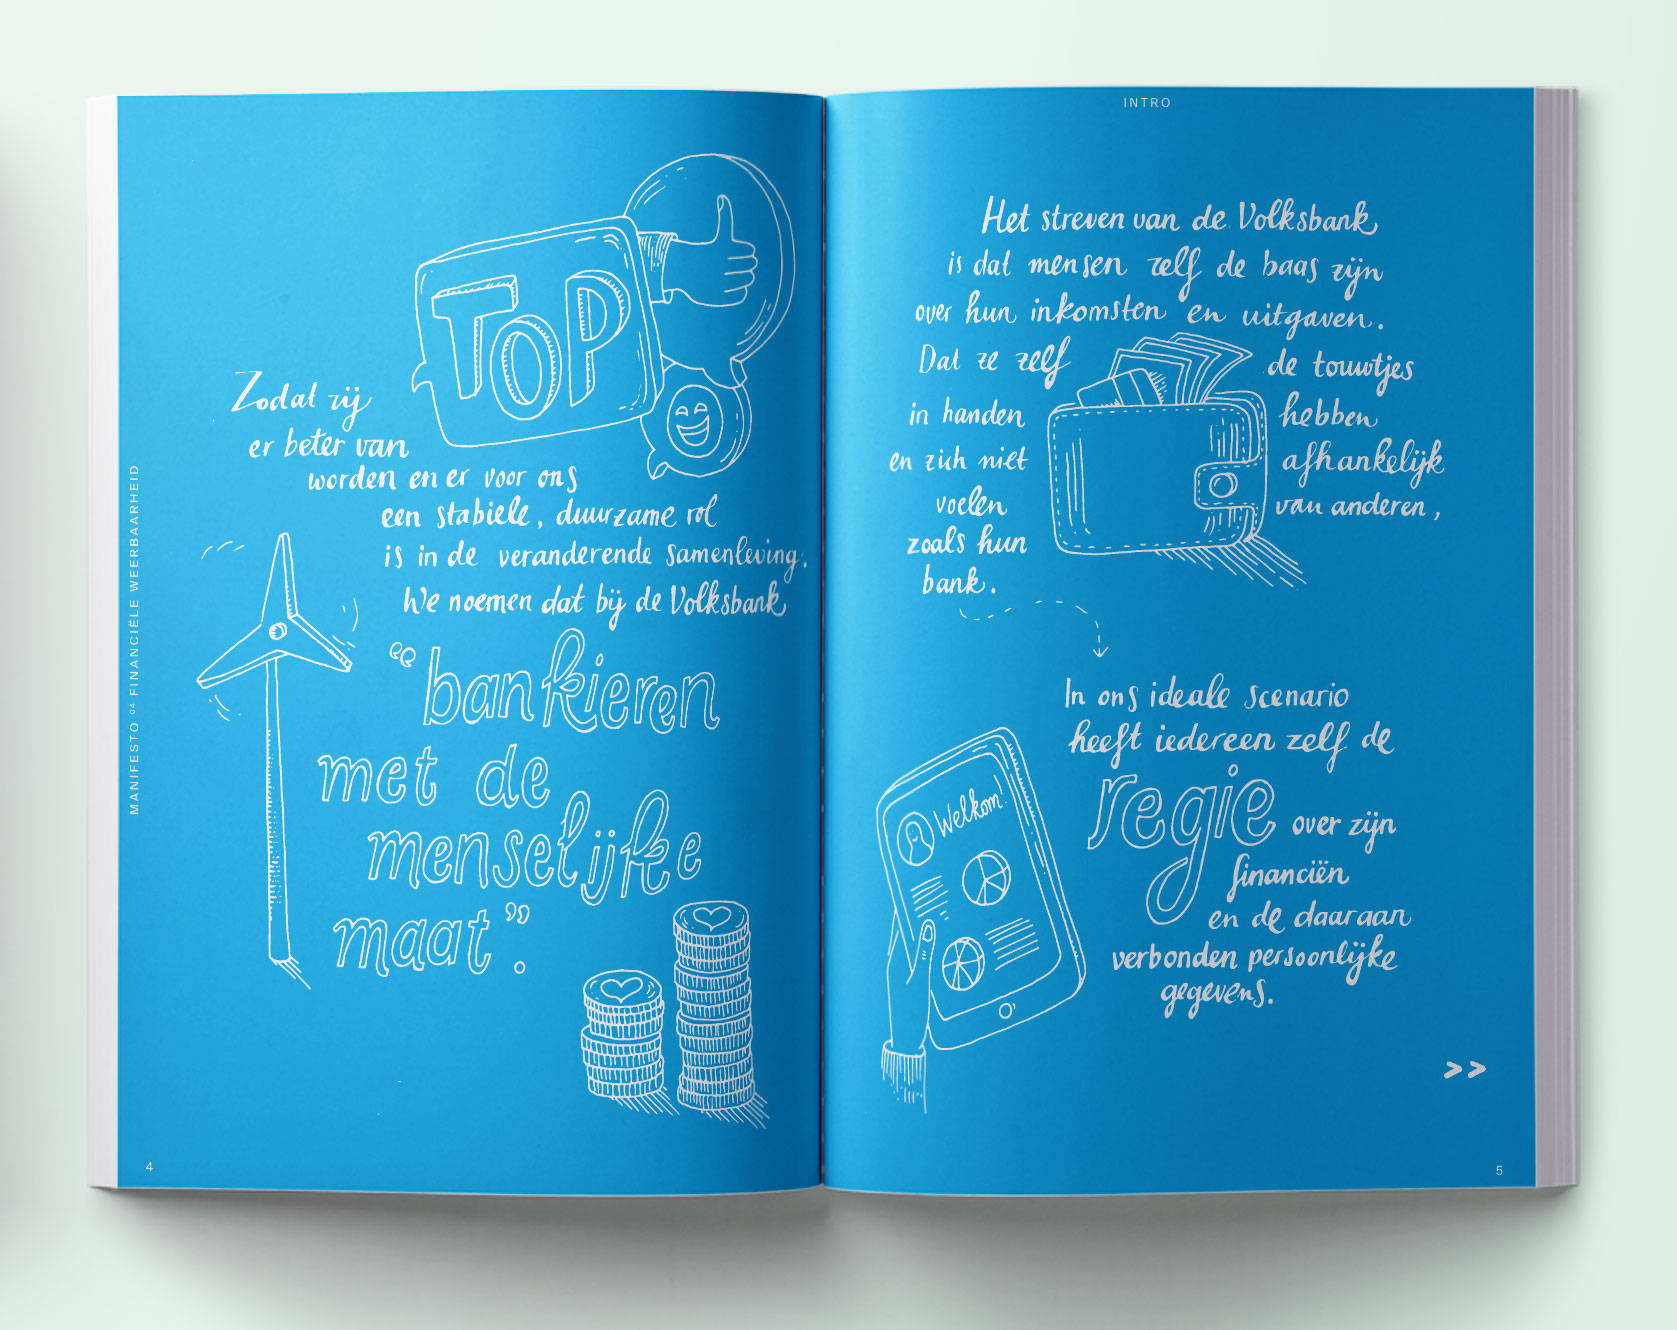 KAZEZE-grafisch-ontwerp-Amsterdam-illustraties-magazine-handgetekende-letters-handlettering-manifesto#4-07_spread2.jpg